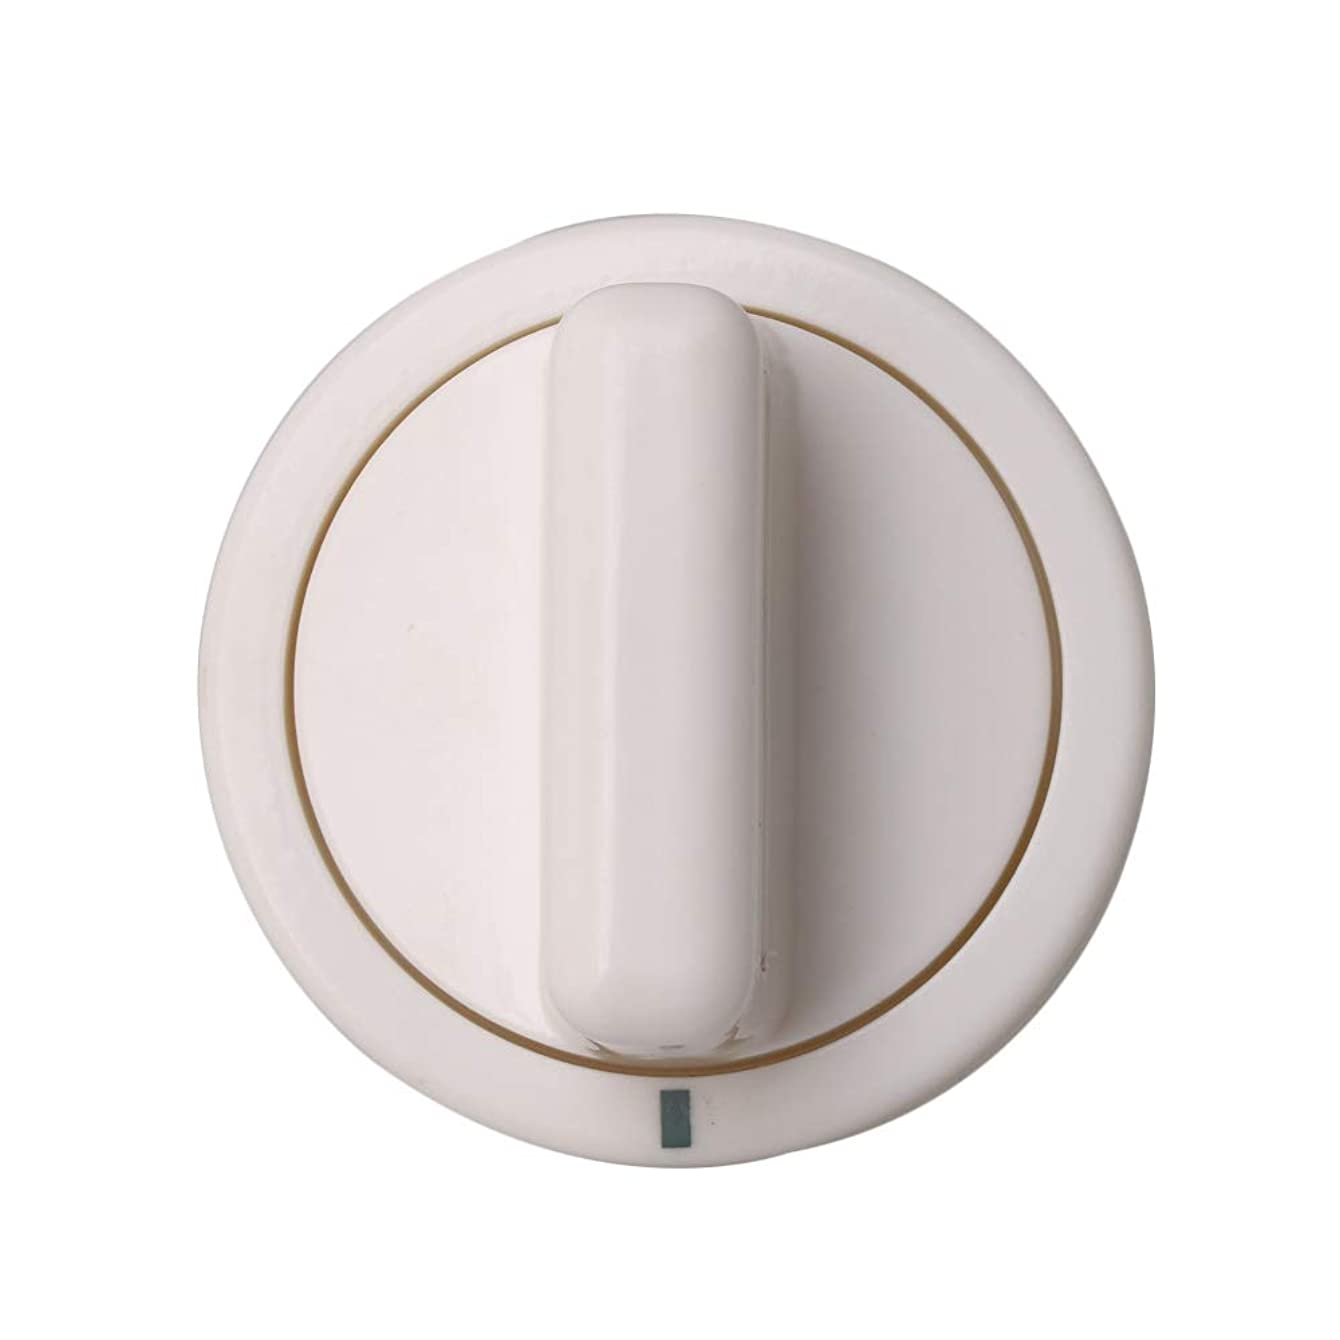 BQLZR WE01X10160 Dryer Knob Compatible for GE Dryer Timer Control Knob AP3207448 PS755794